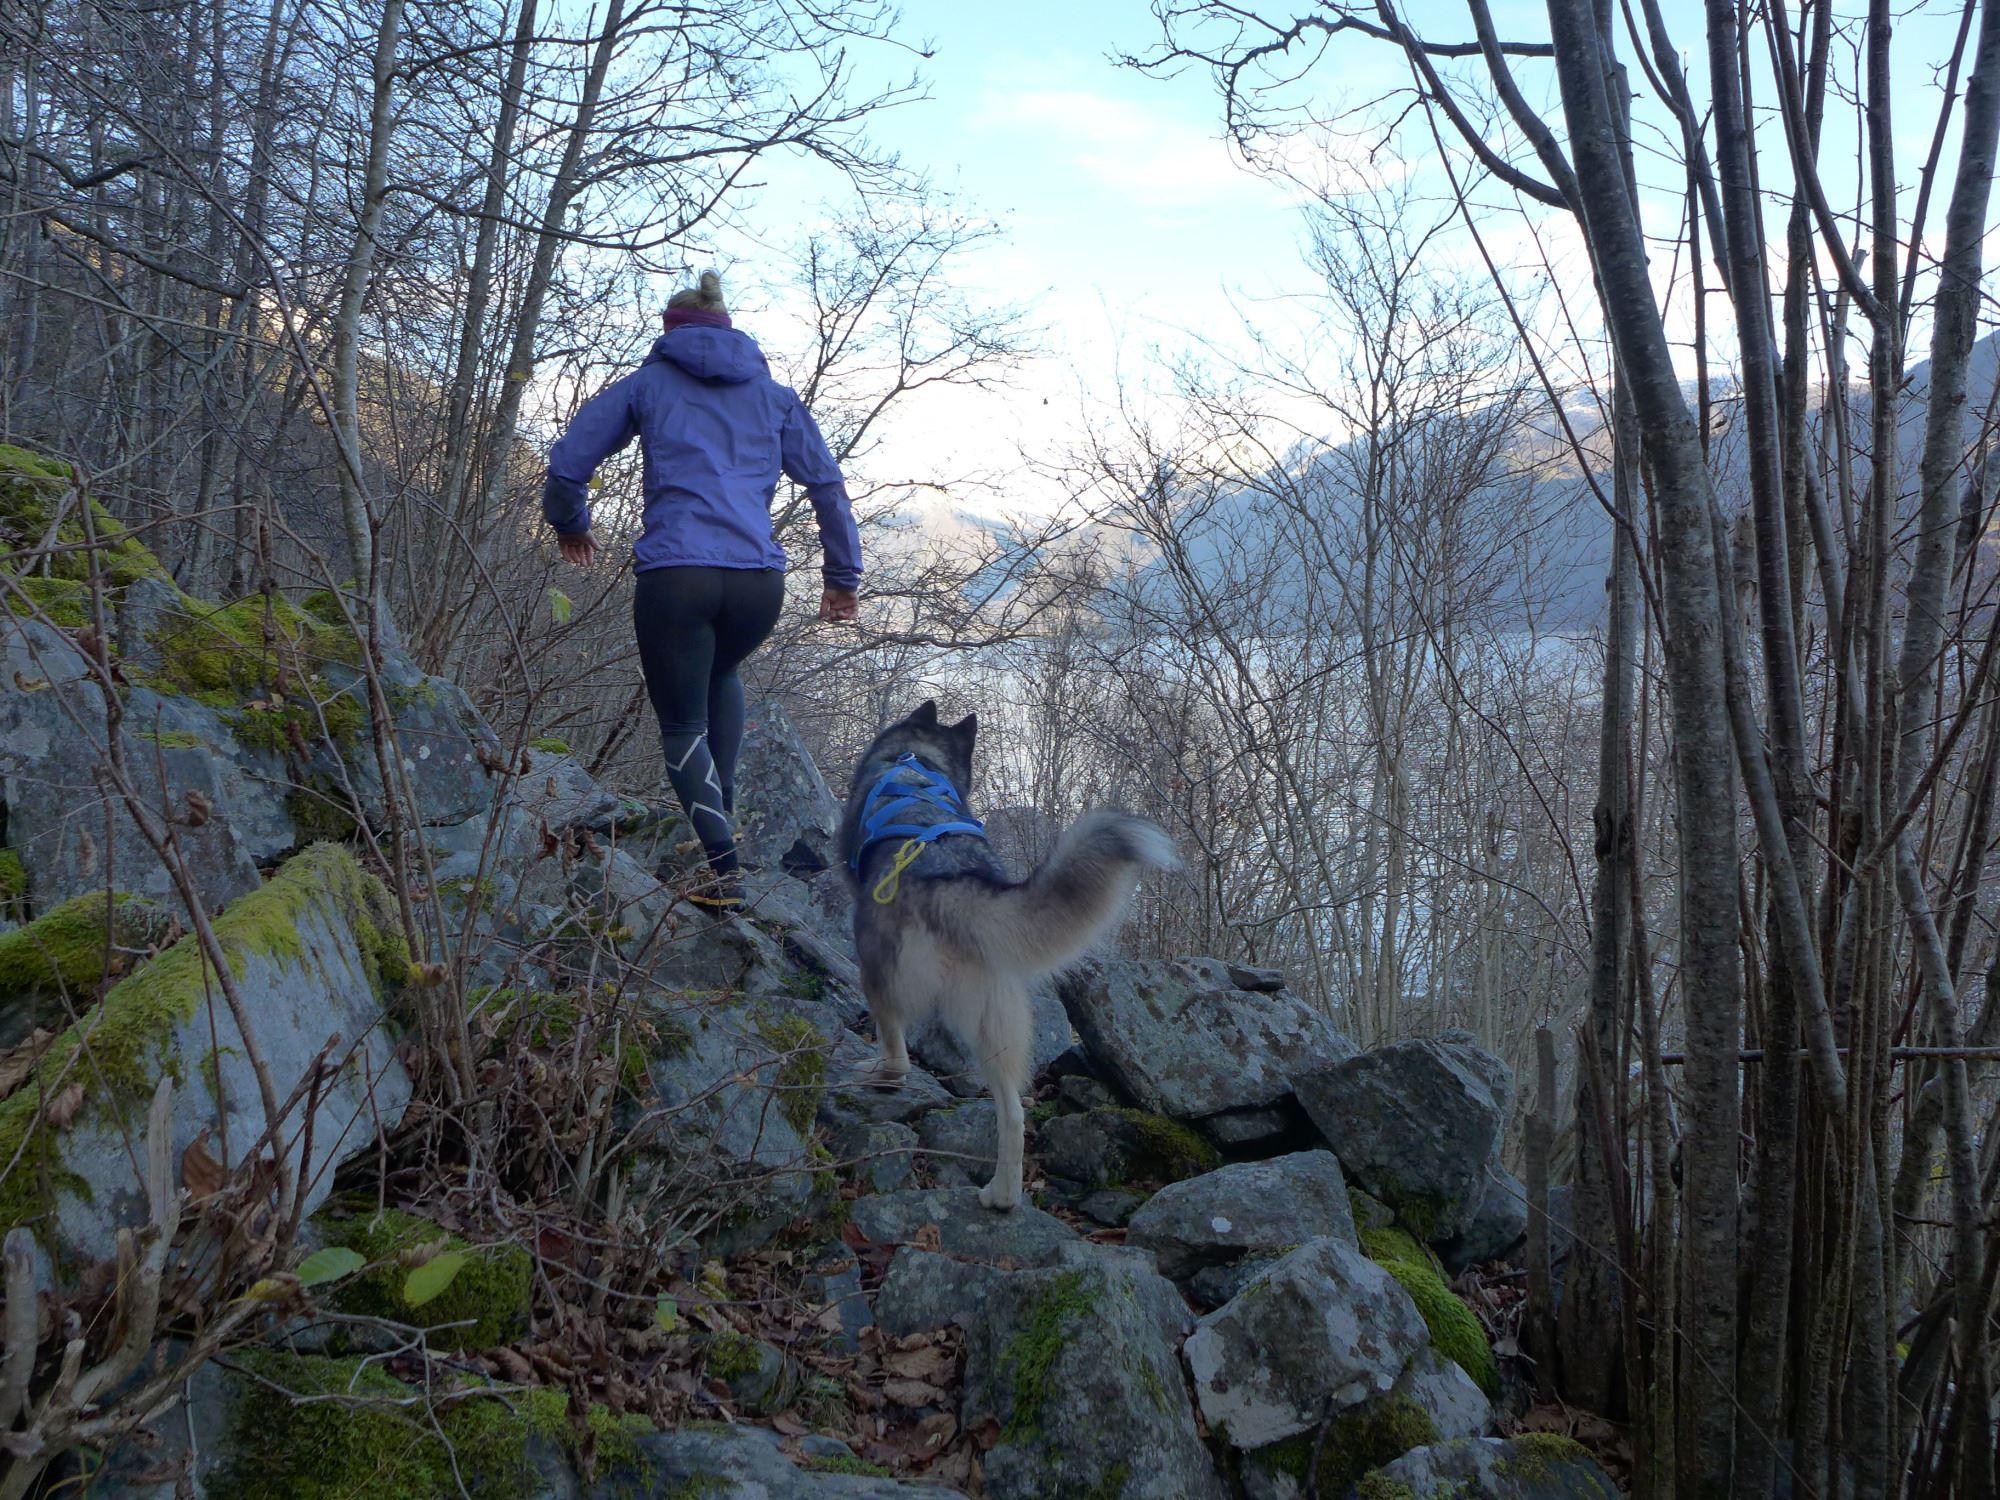 Bergbjørn Fjellservice,  © Bergbjørn Fjellservice, Mountain running with husky - Bergbjørn Fjellservice